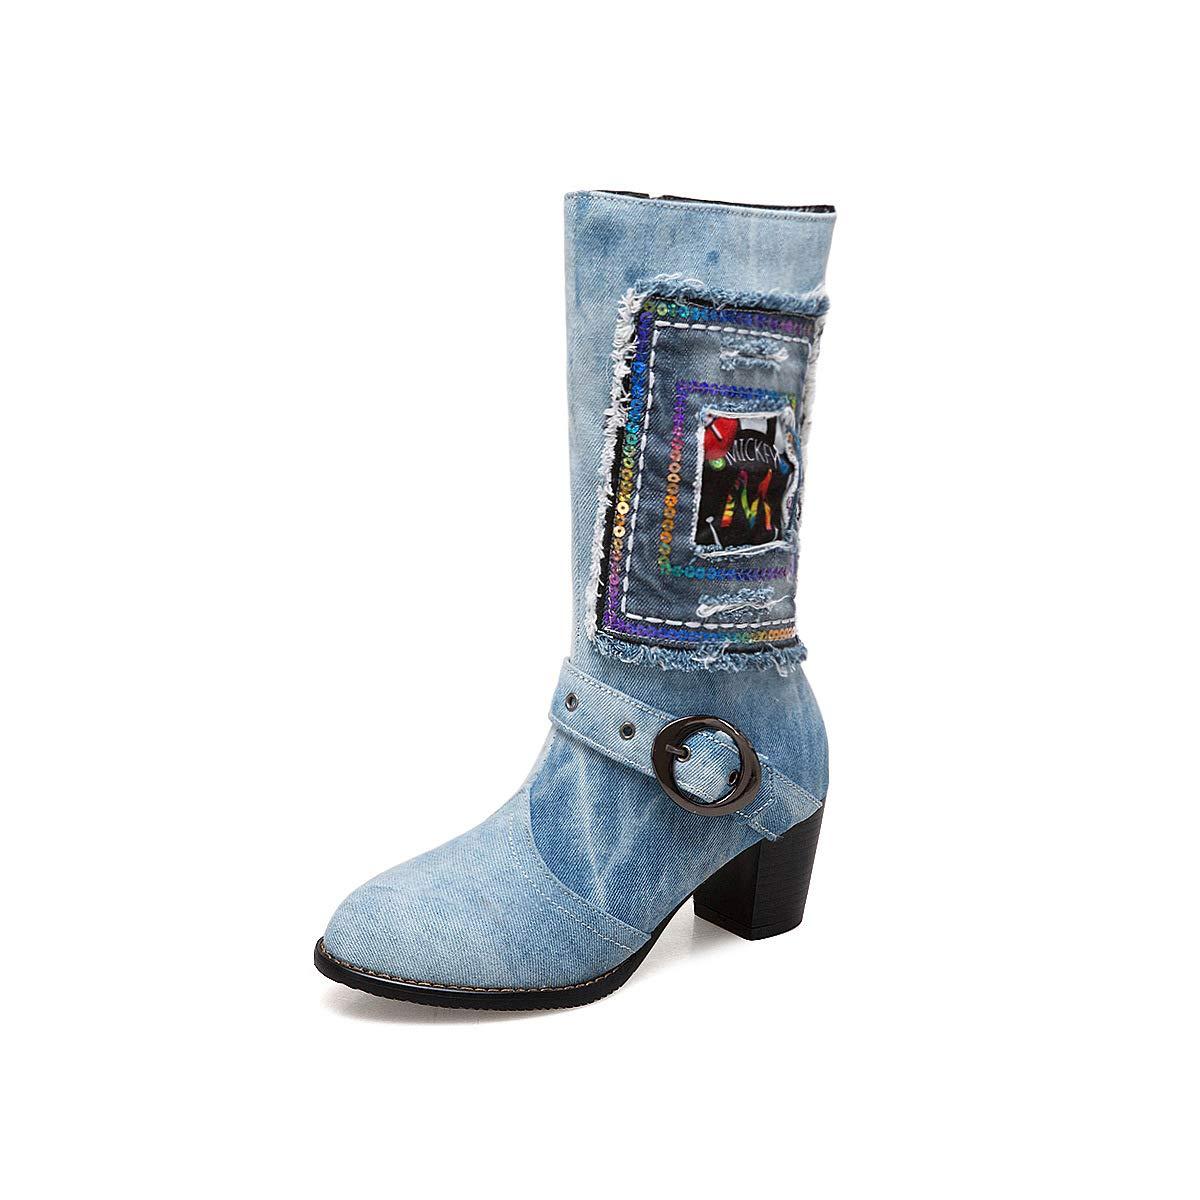 Lsm-Stiefel Damen Denim Stoff Runde Toe Block Heel Heels Middle Stiefel